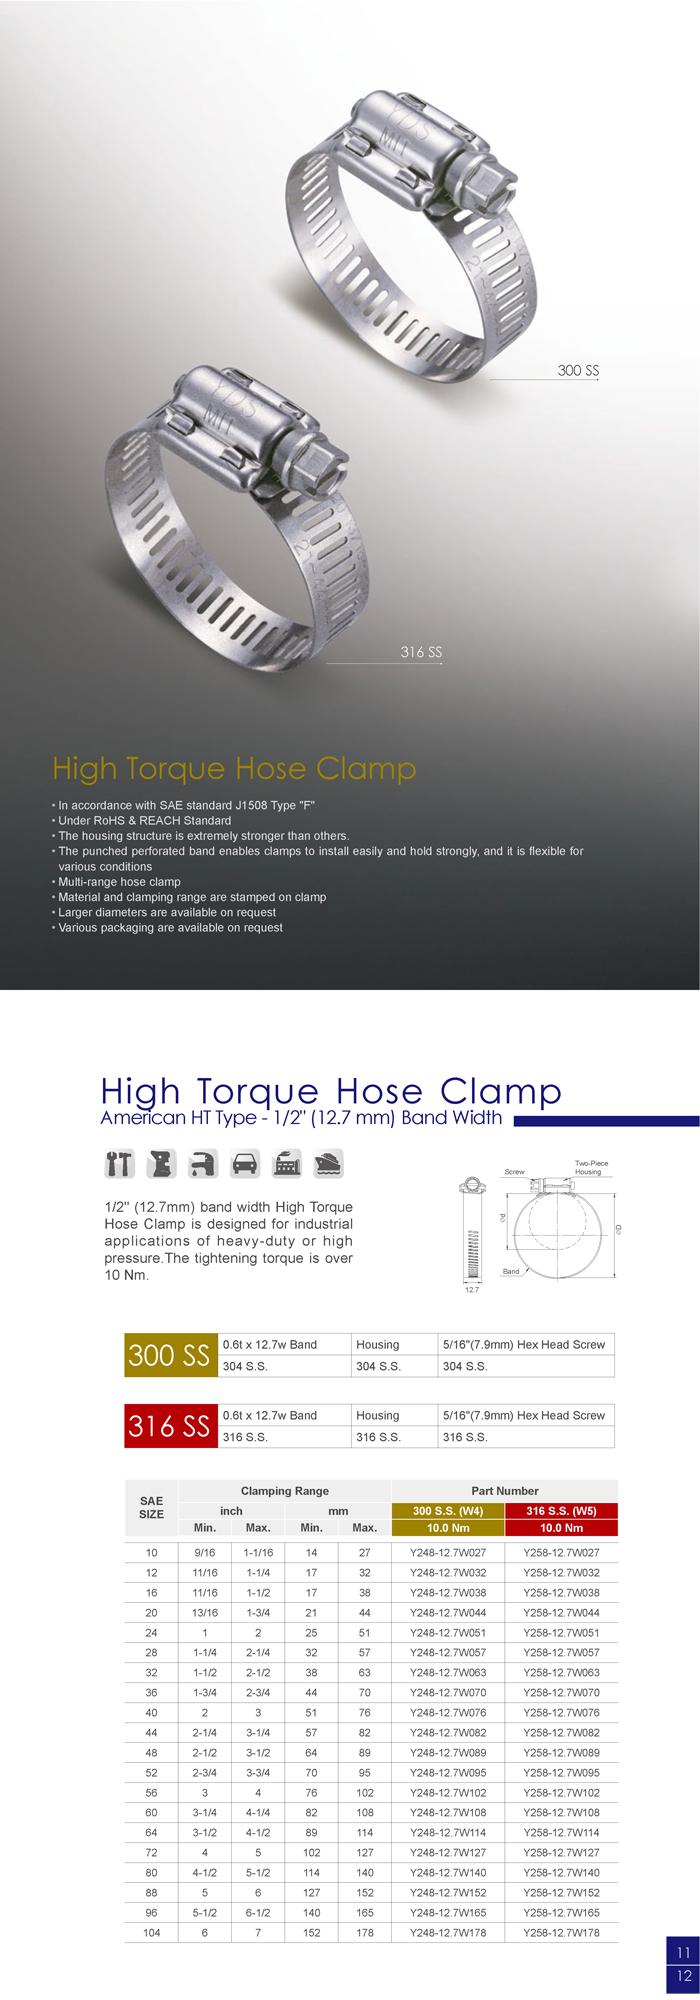 High Torque Hose Clamp (American type)